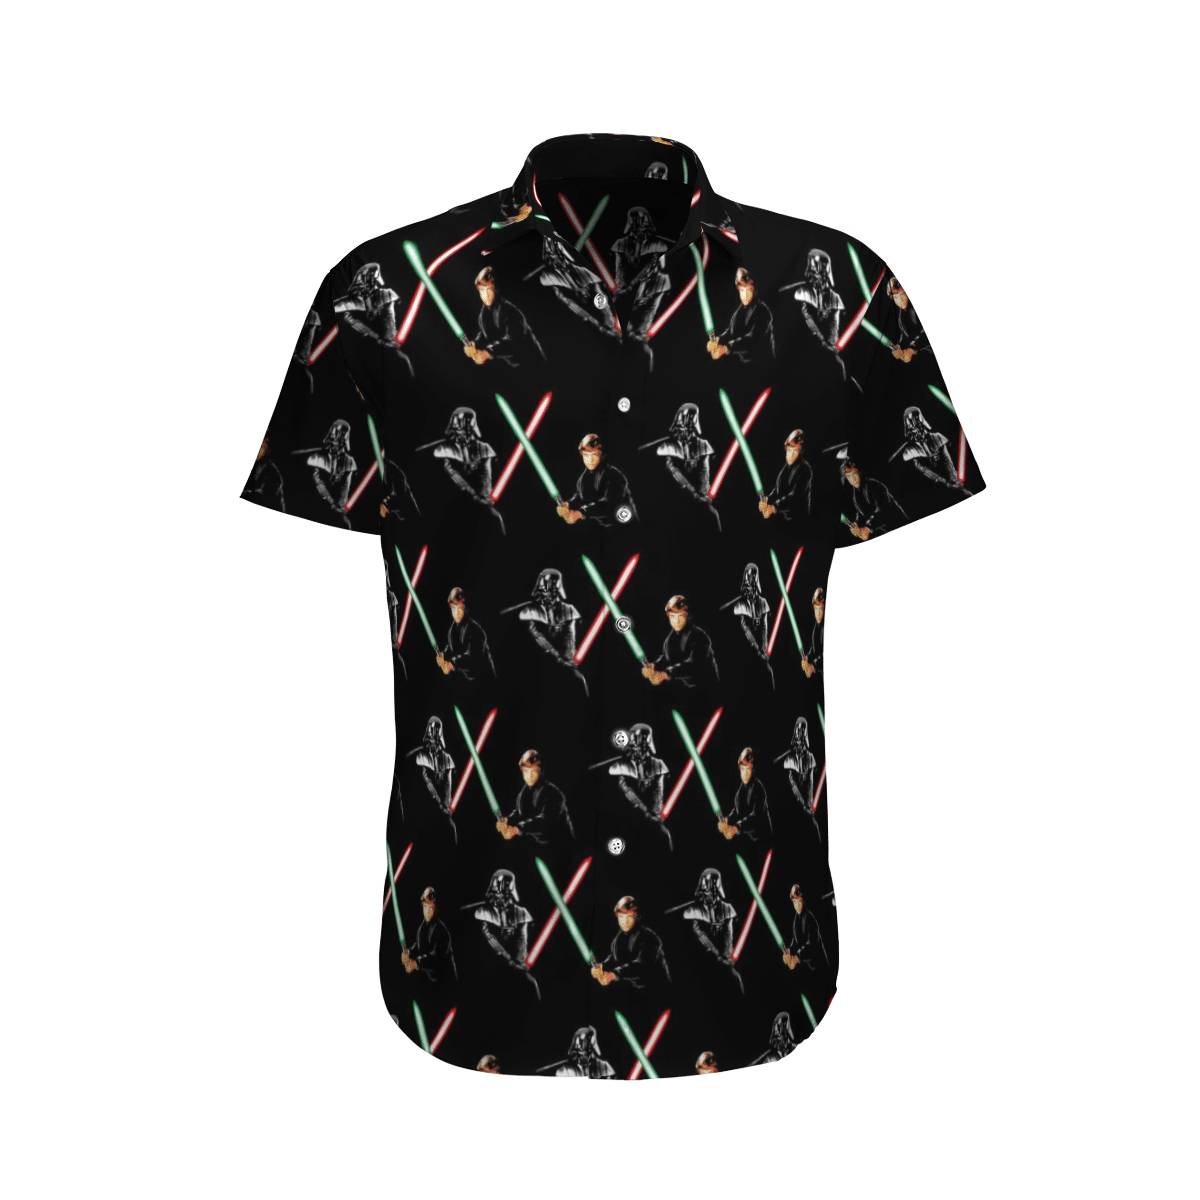 Star wars Darth Vade vs Kylo Ren Hawaiian Shirt